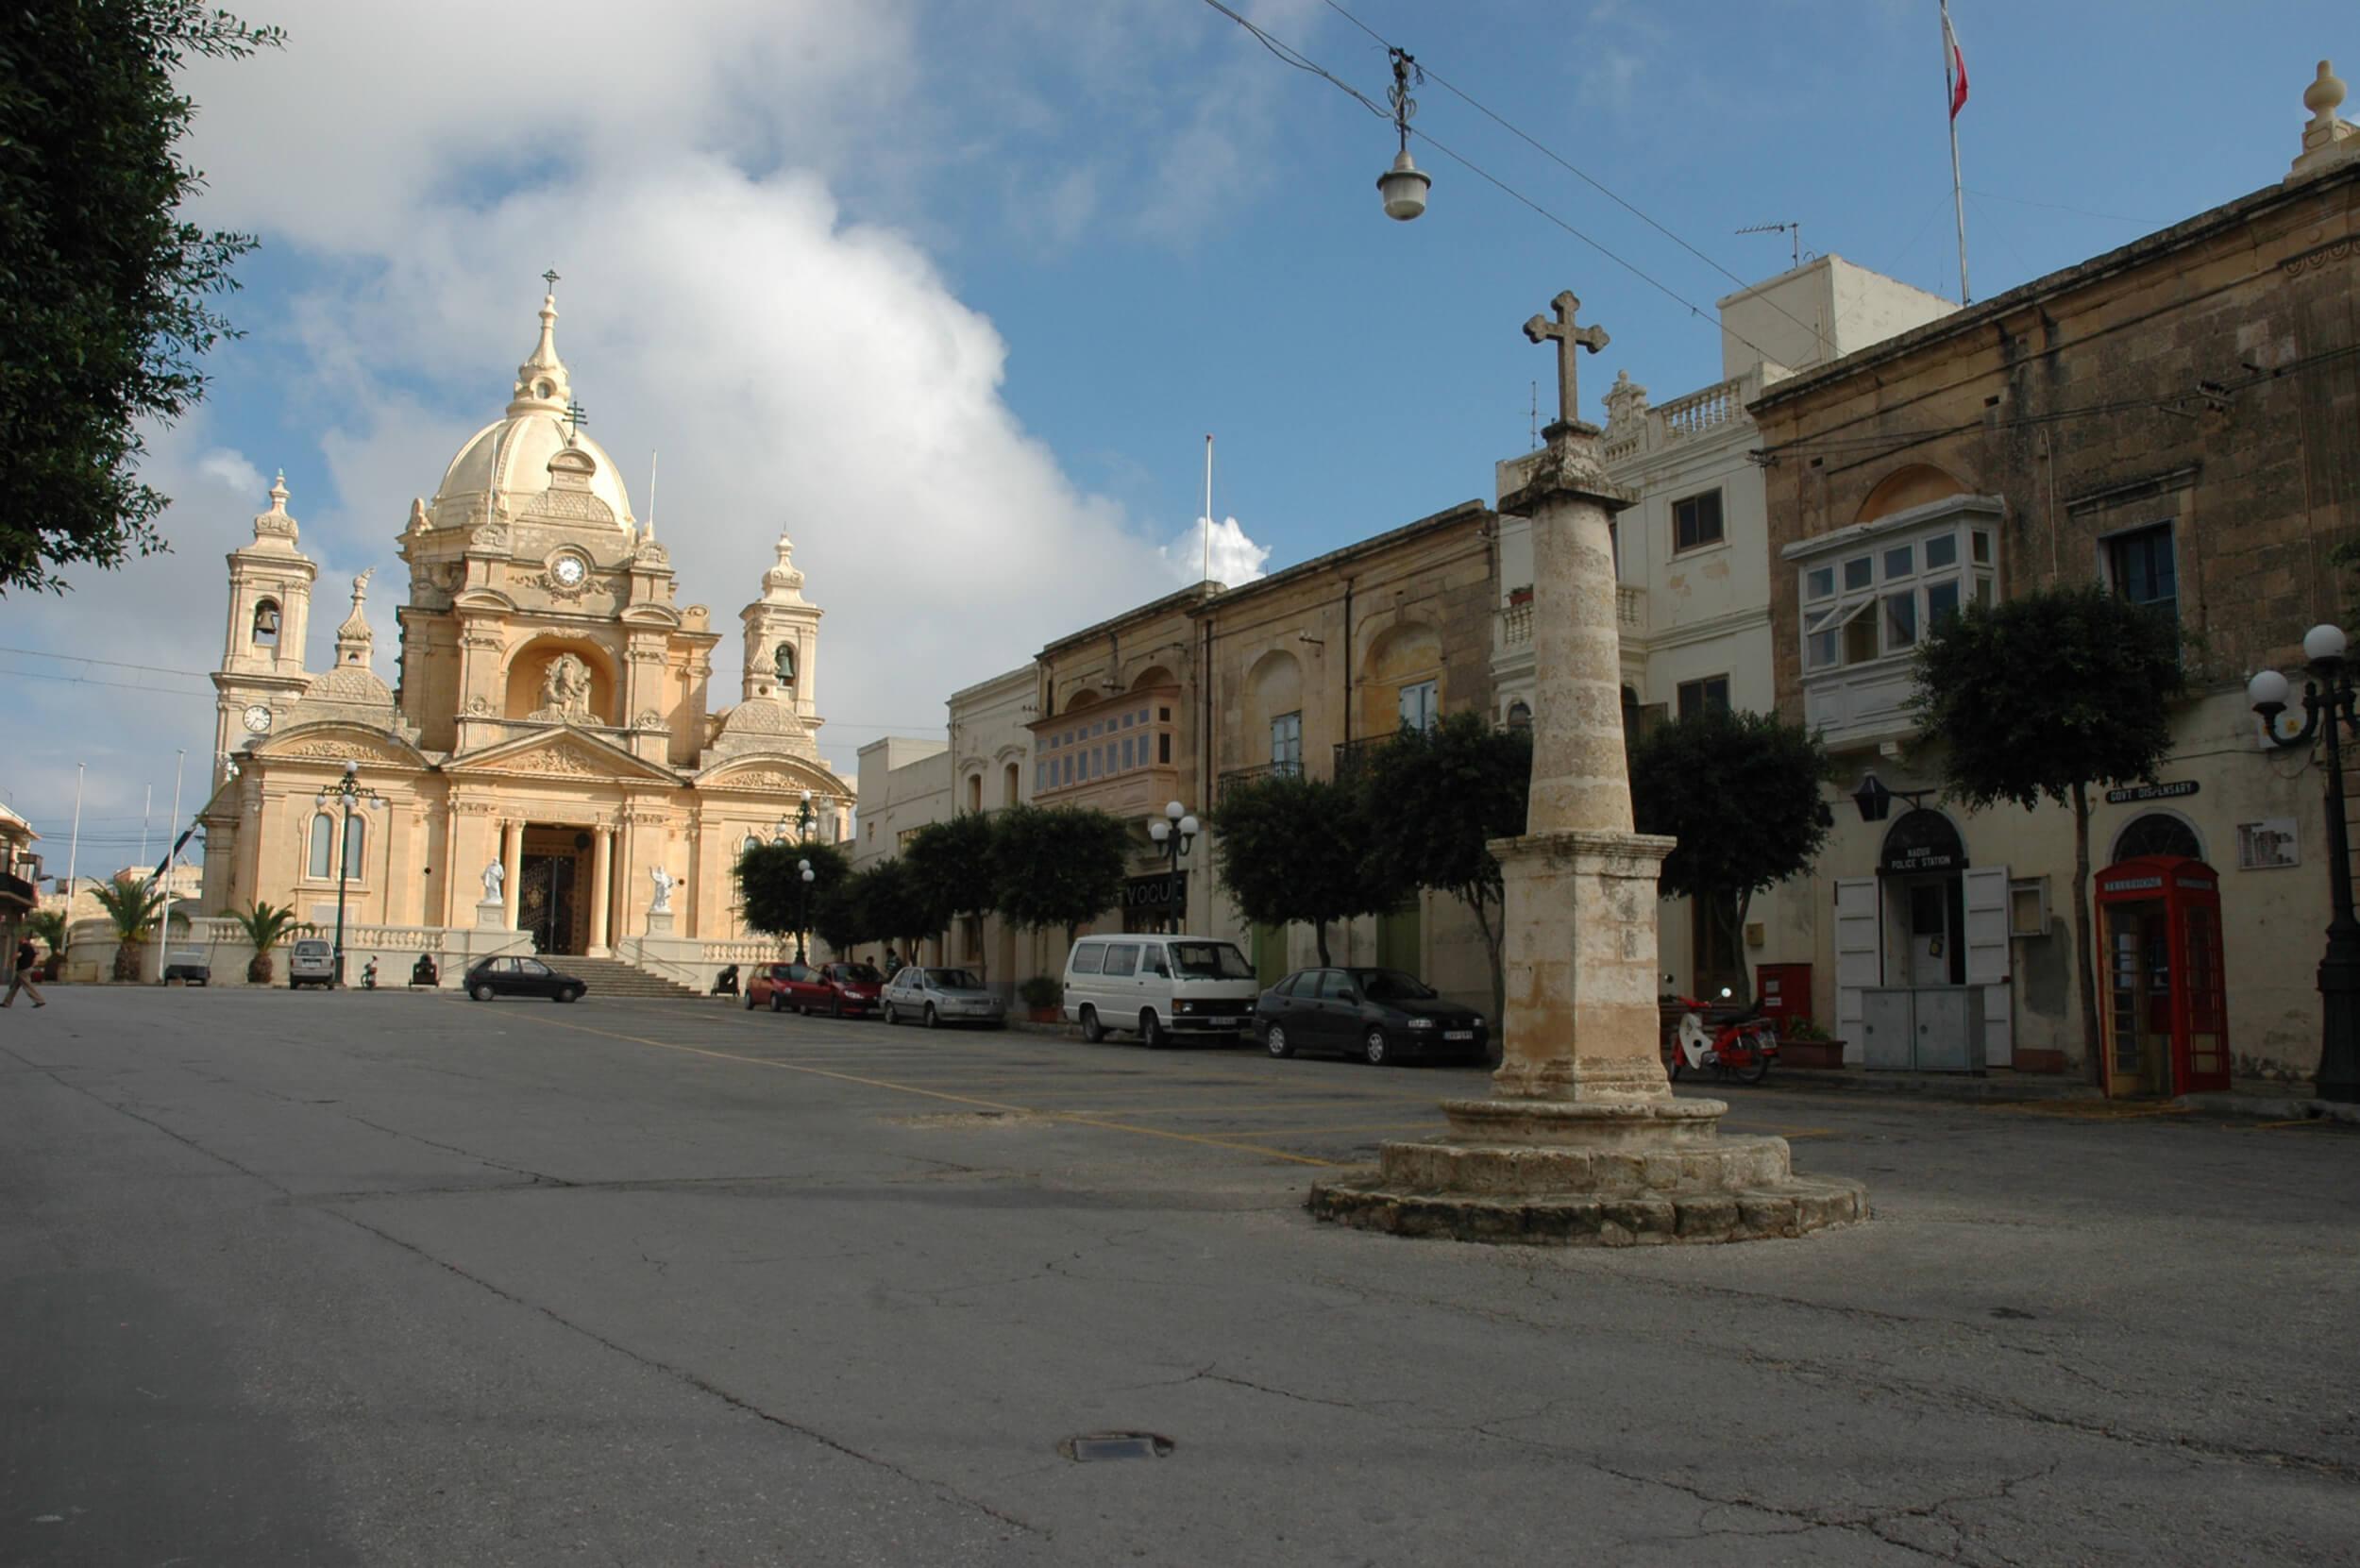 Church of Saints Peter & Paul